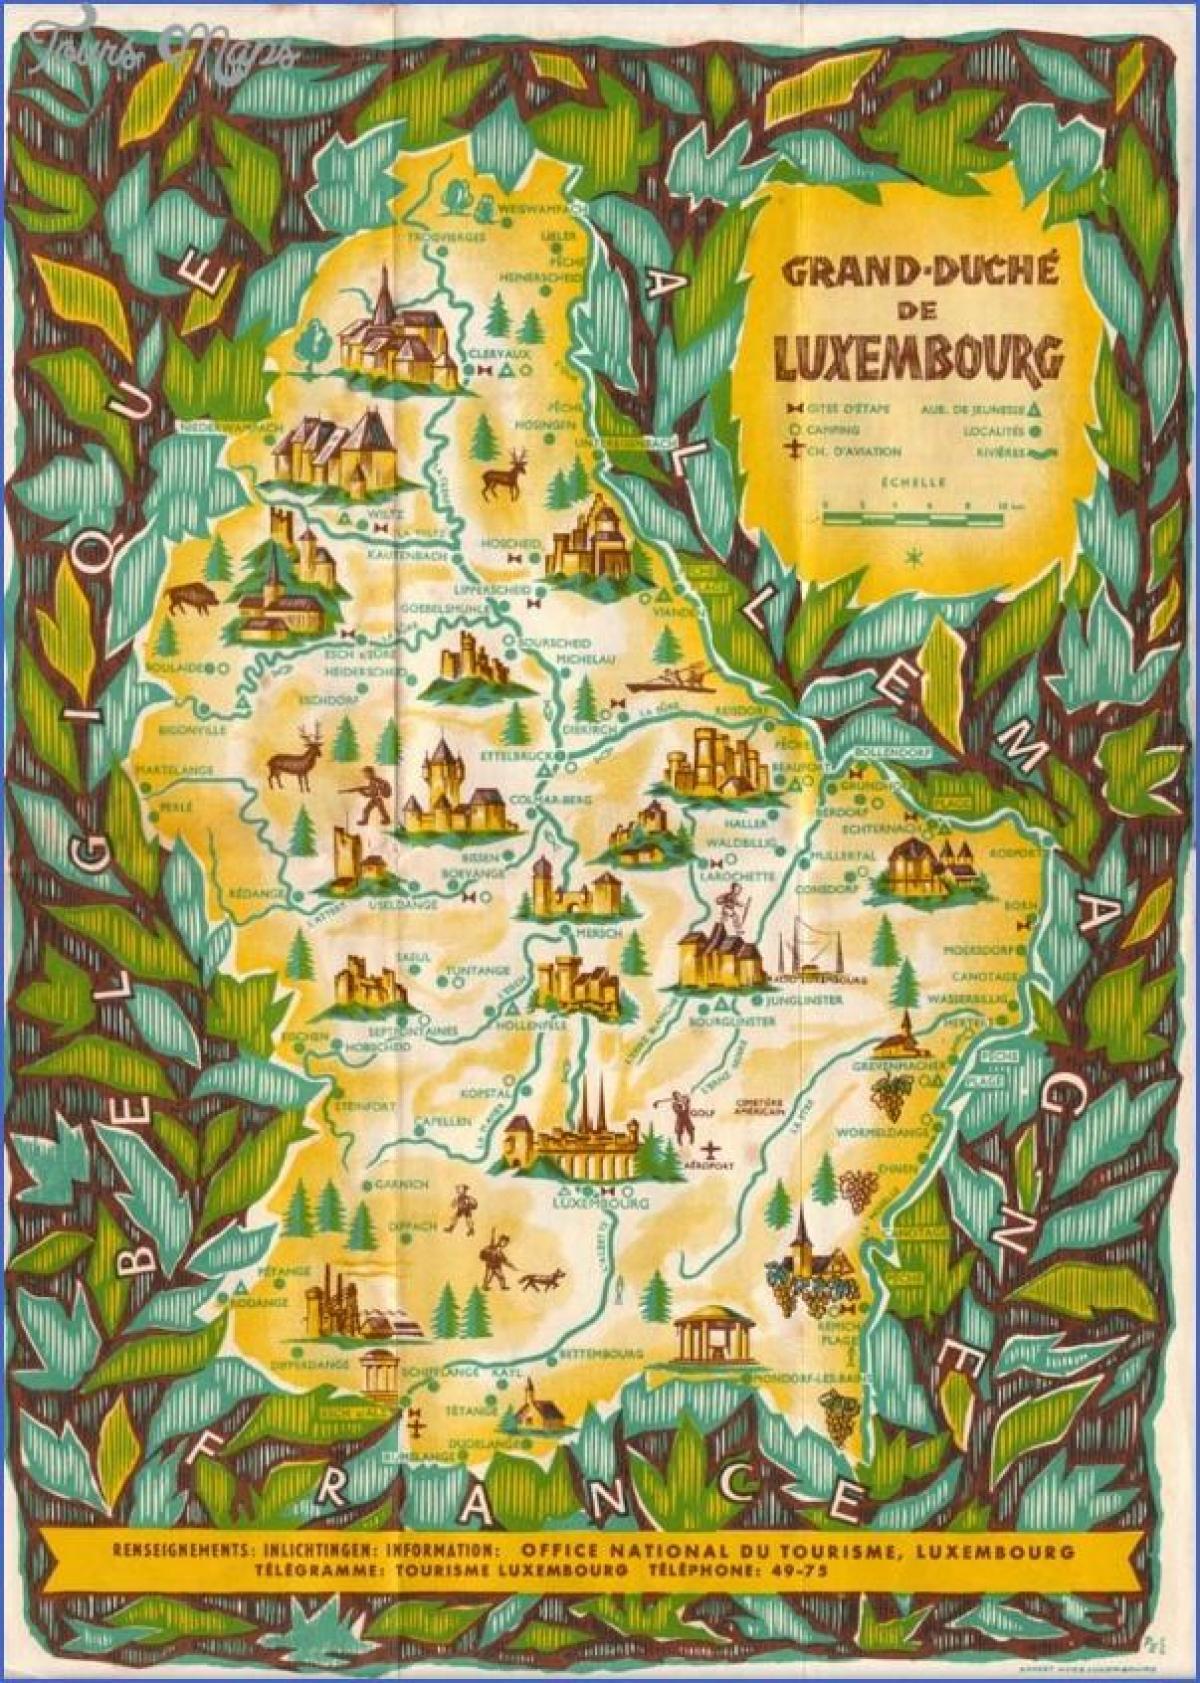 Luxembourg Sightseeing Kart Kart Over Luxembourg Sightseeing